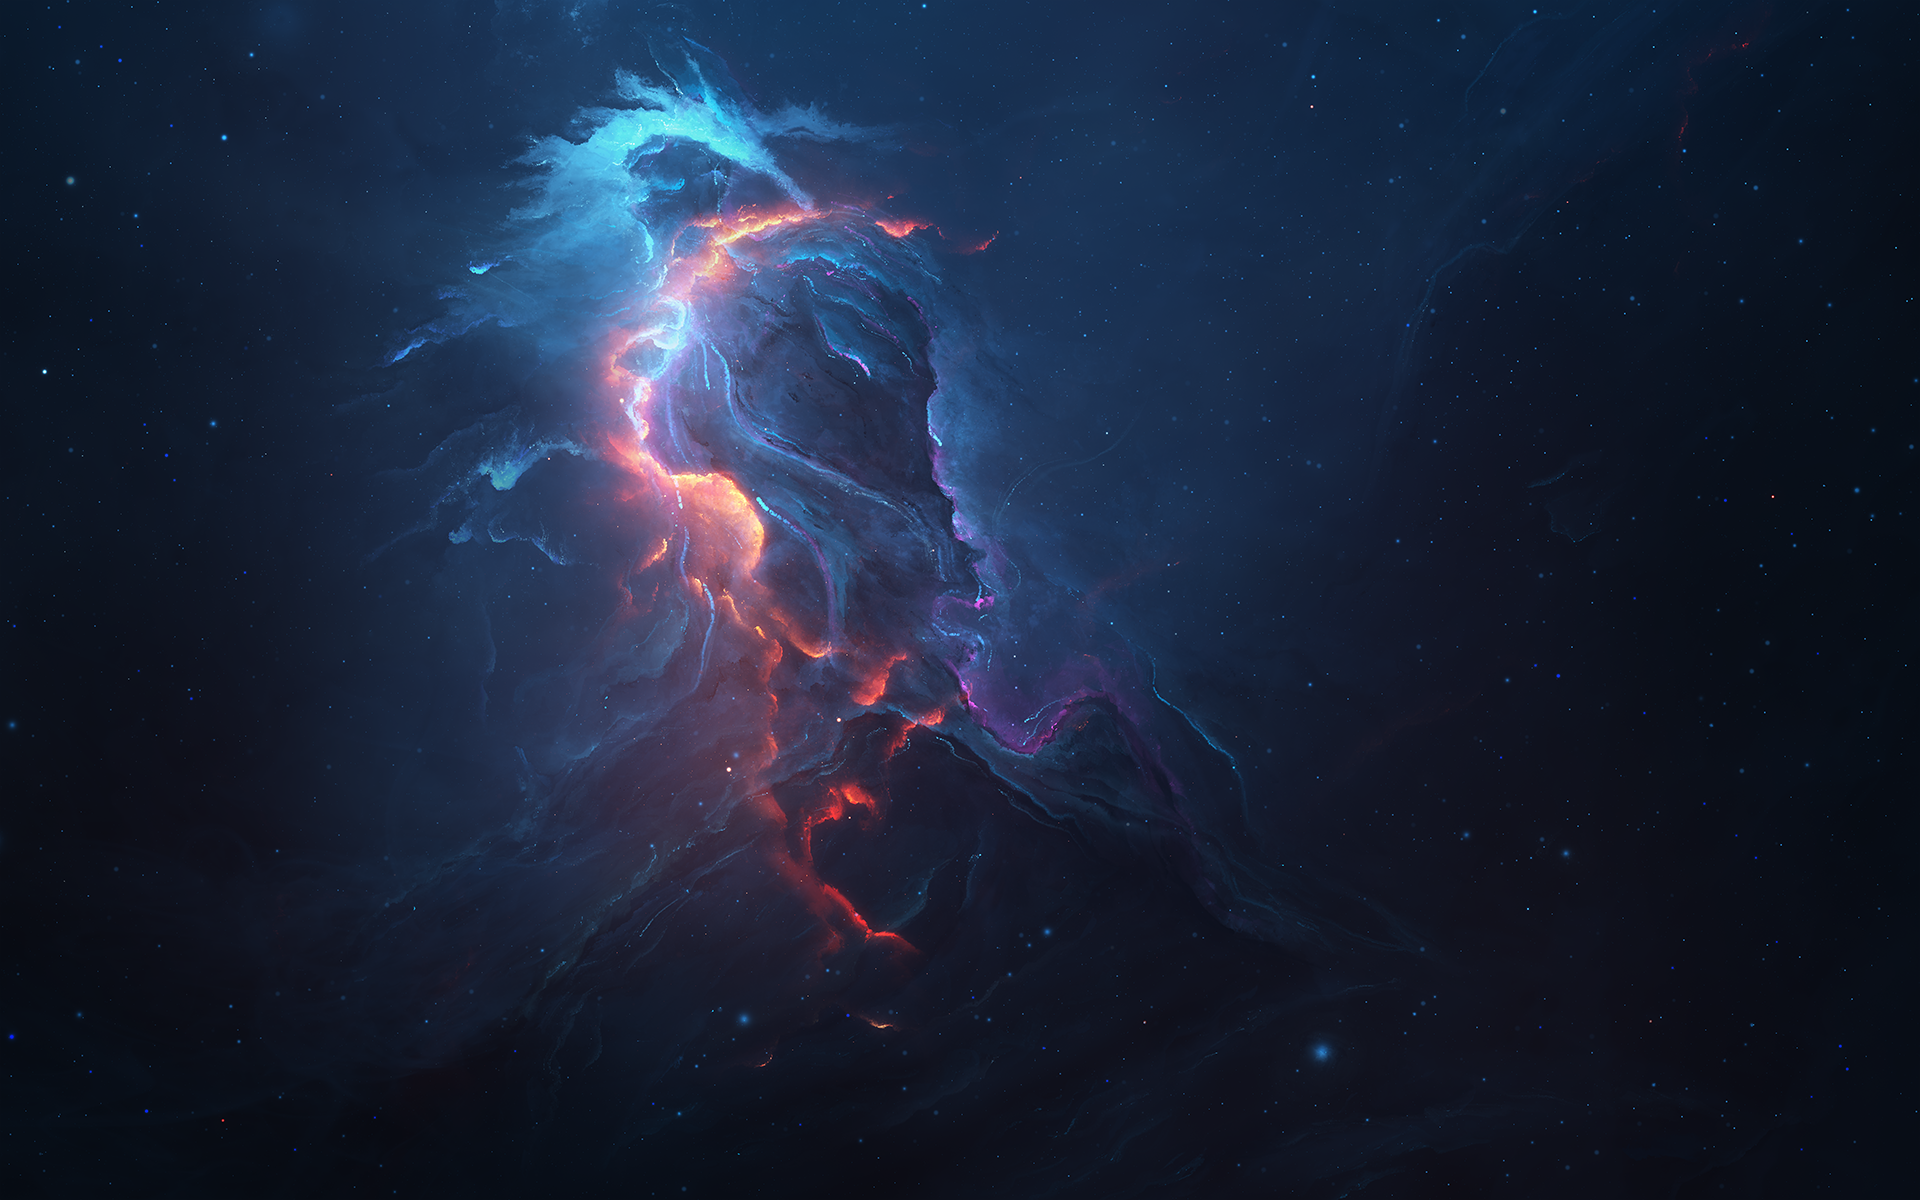 Atlantis on fire full hd wallpaper and background image for Sfondi spazio full hd